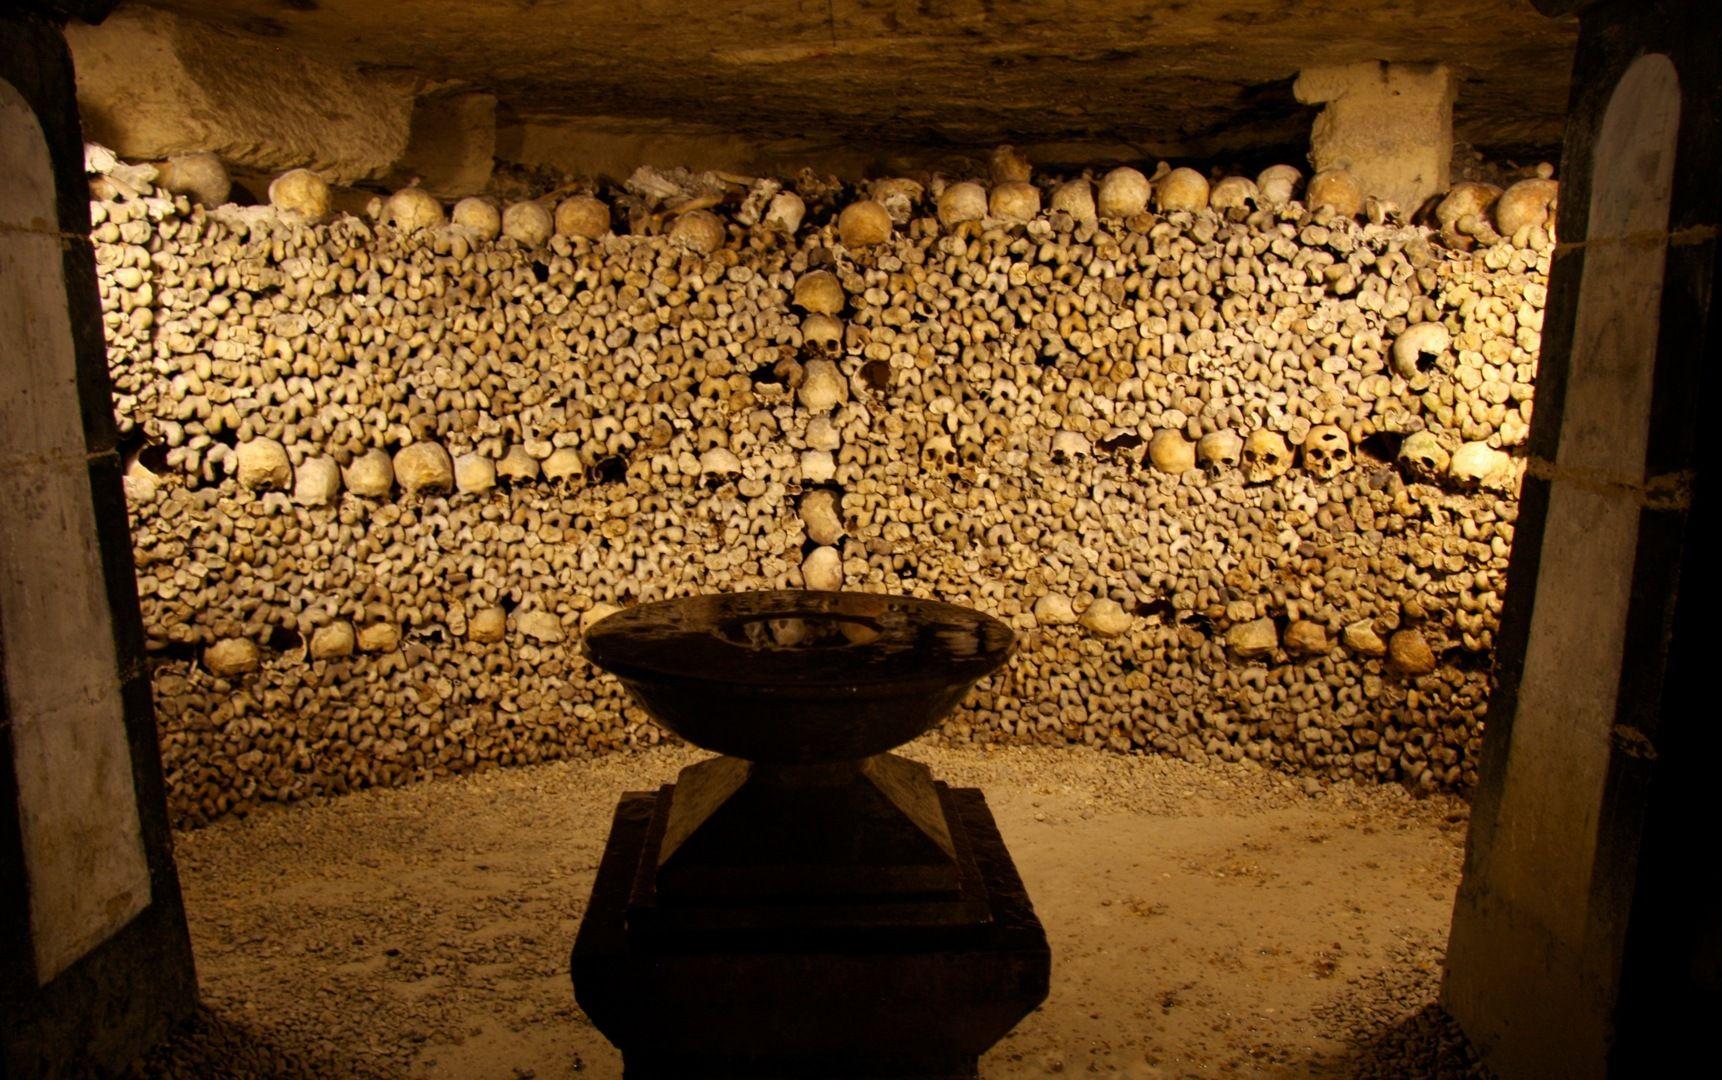 Paris_Catacombs_Crypt_of_the_Sepulchral_Lamp.jpg (1722×1080)